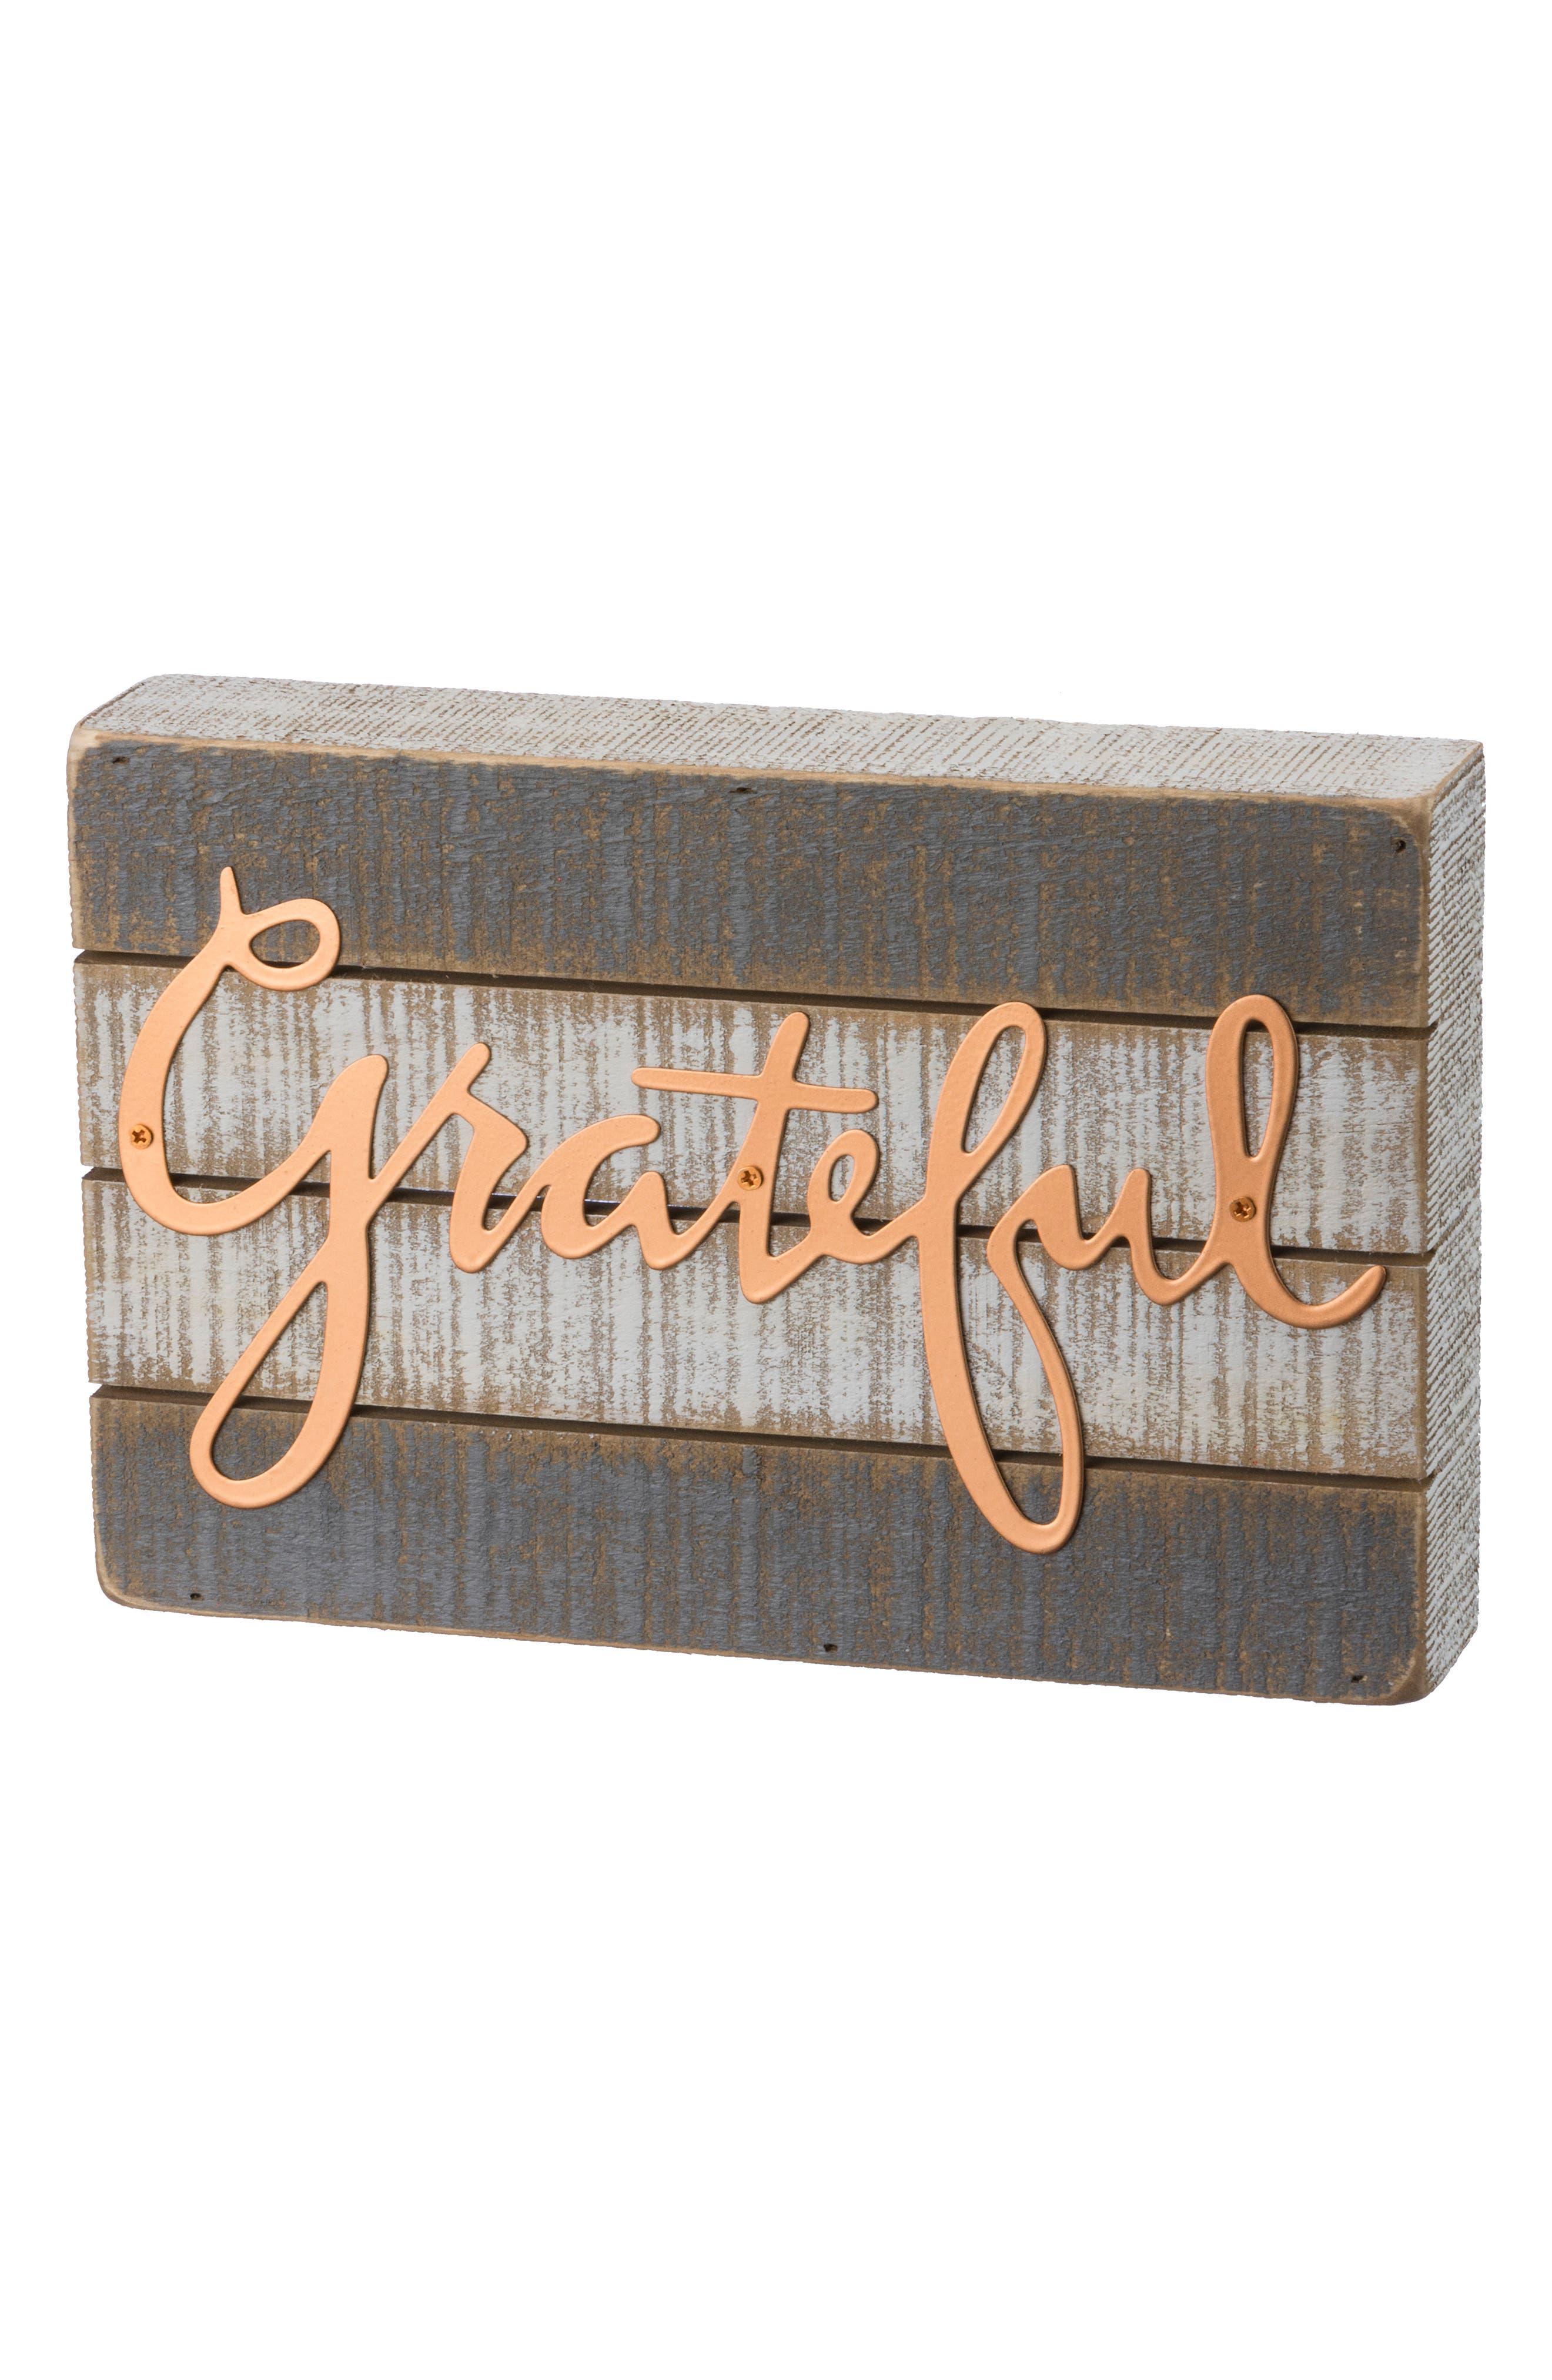 Alternate Image 1 Selected - Primitives by Kathy Grateful Wood Box Sign